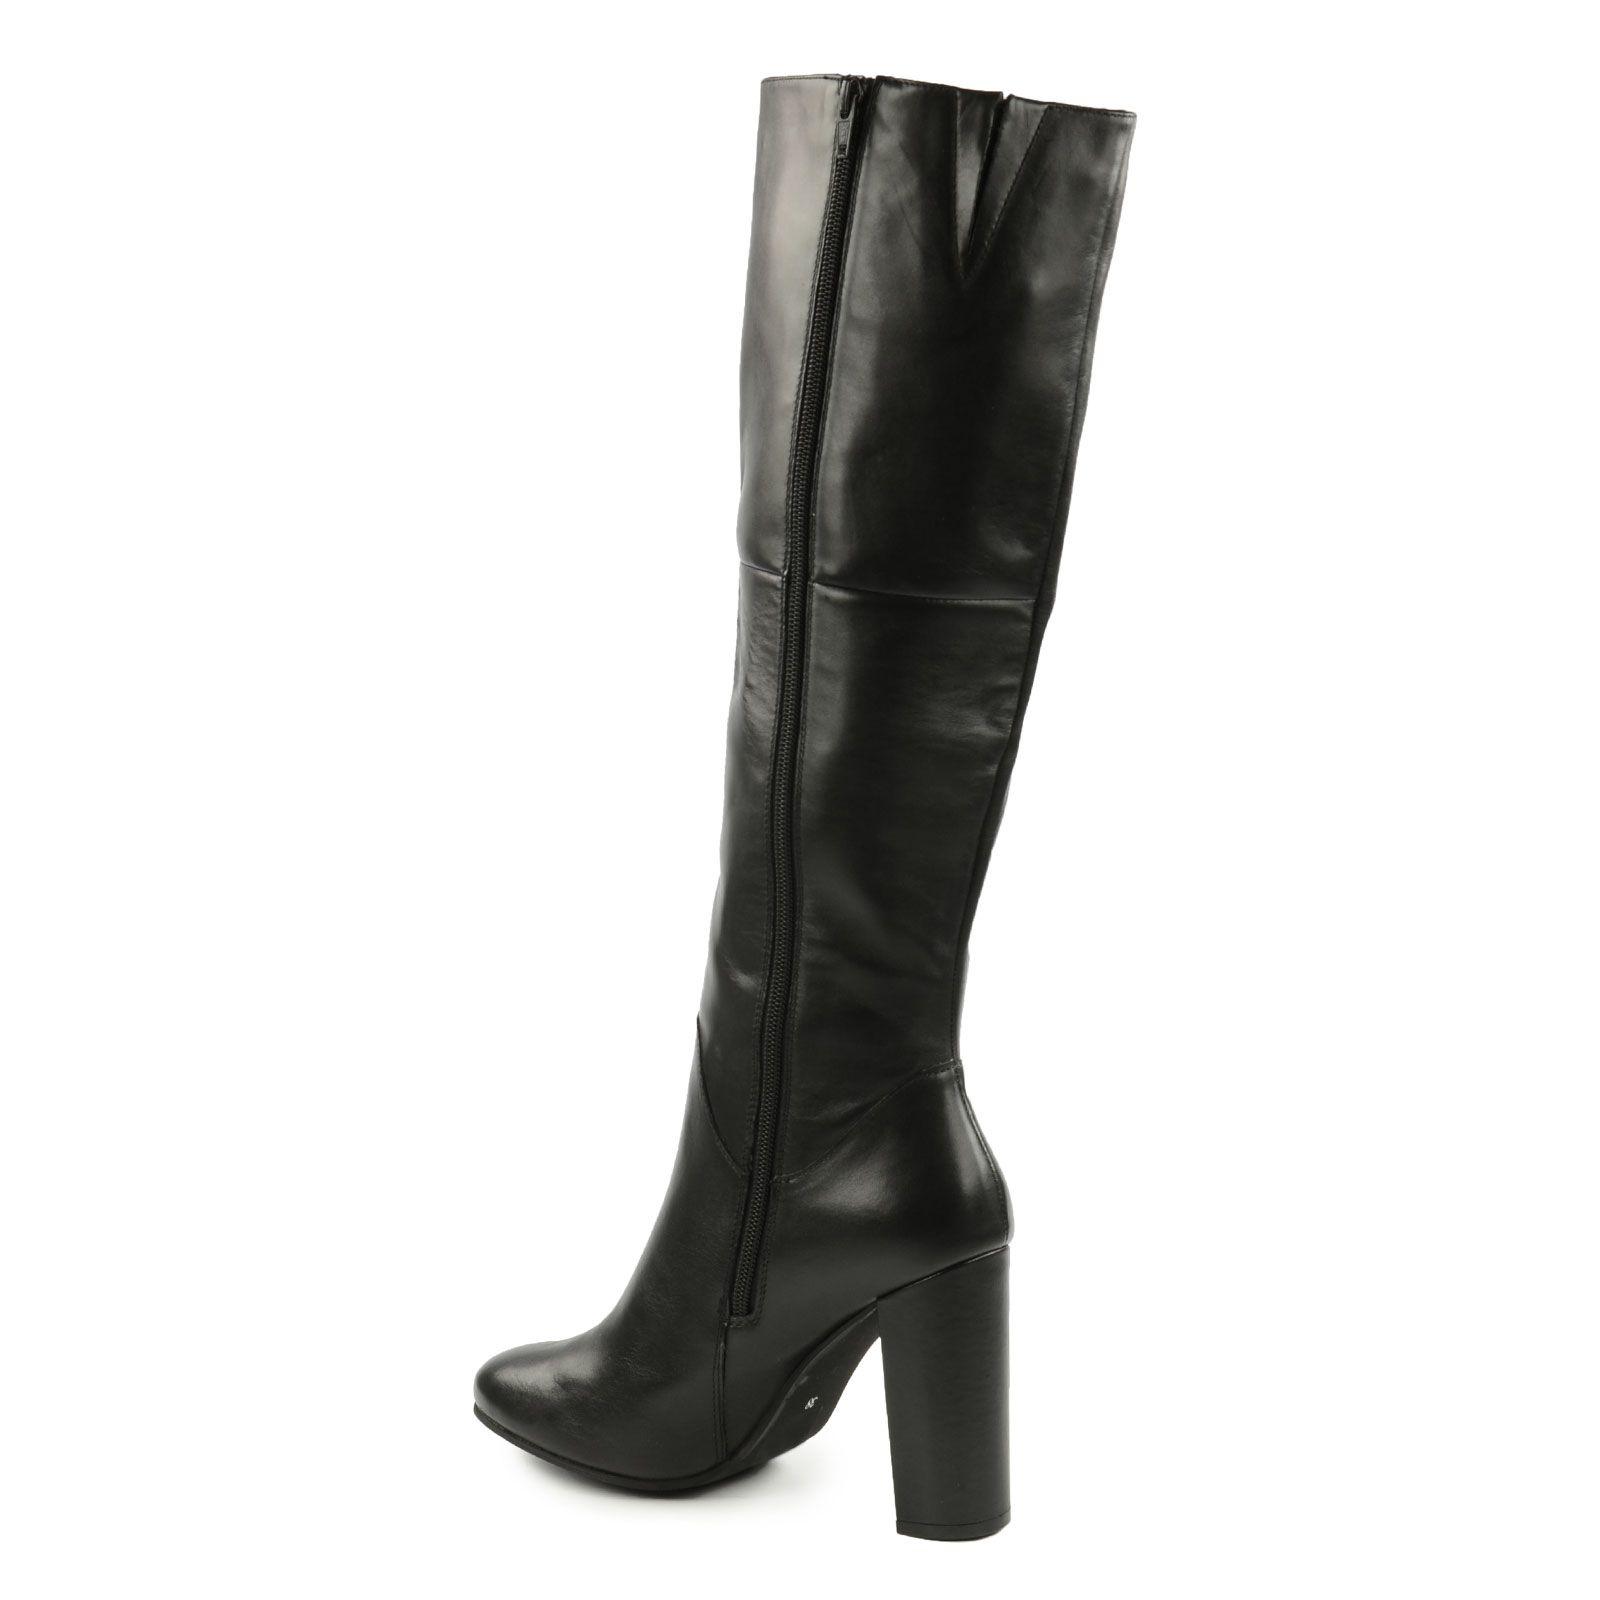 Bottes hautes en cuir noir femmes - Verlicht en cuir noir ...